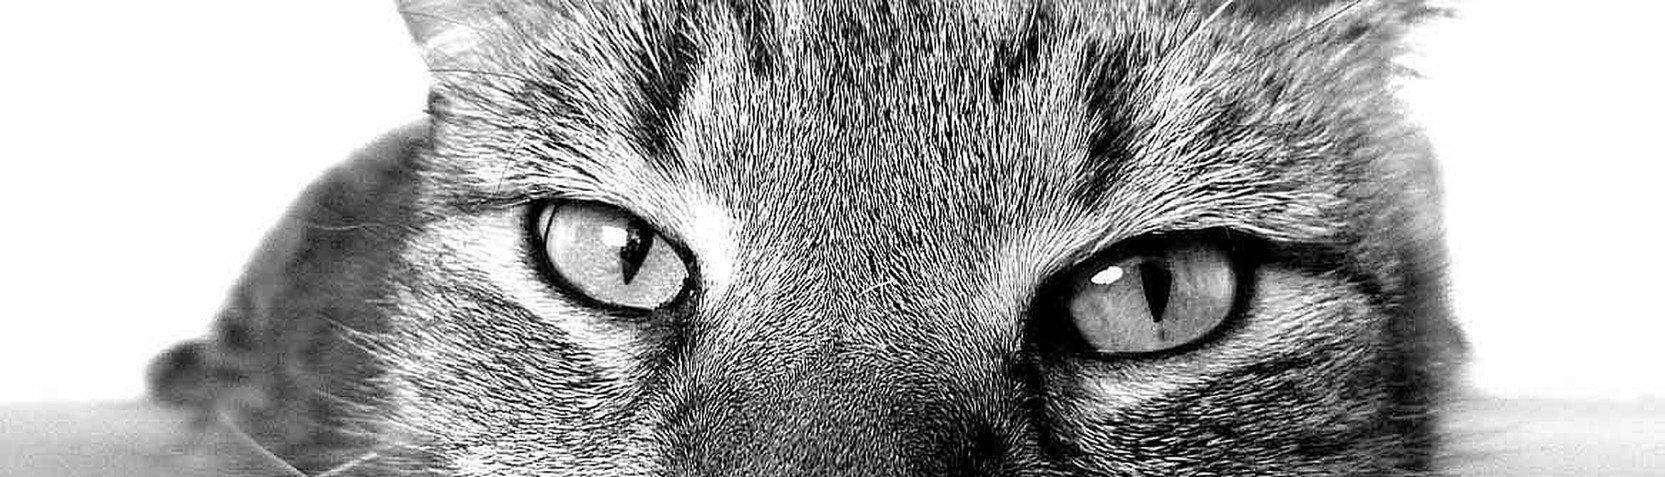 Fotografie - Tierfotografie